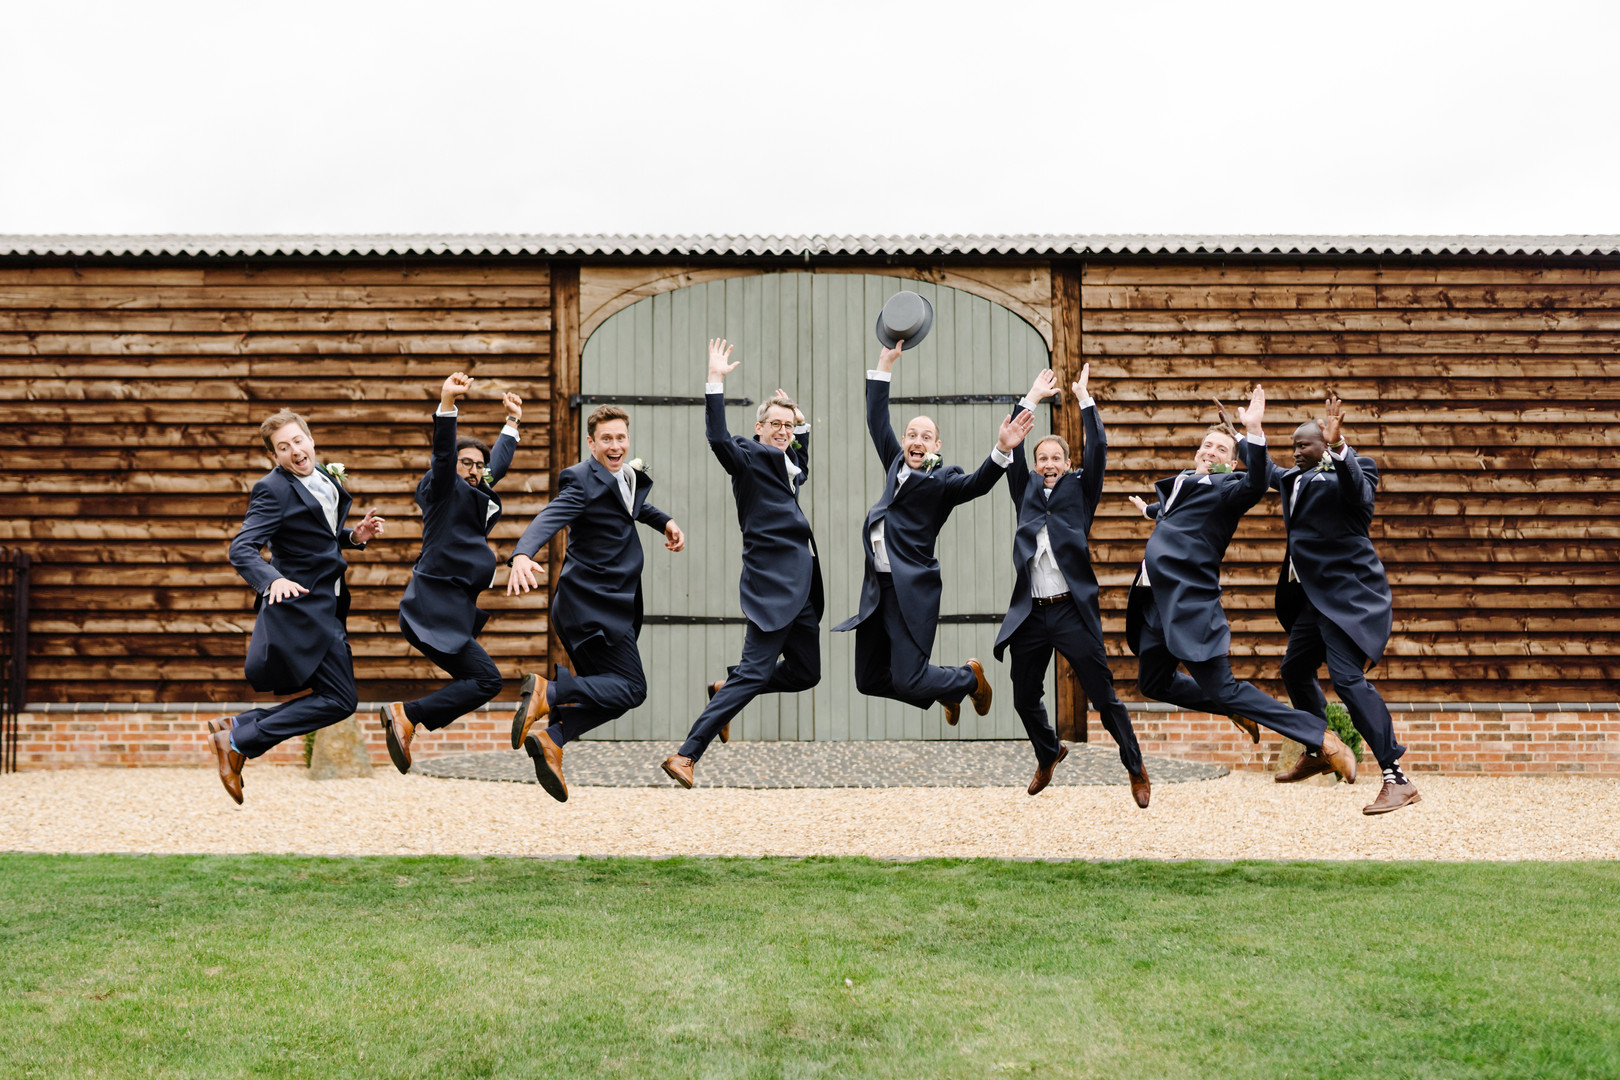 Groomsmen by Chloe Ely Photography Wedding Photographer